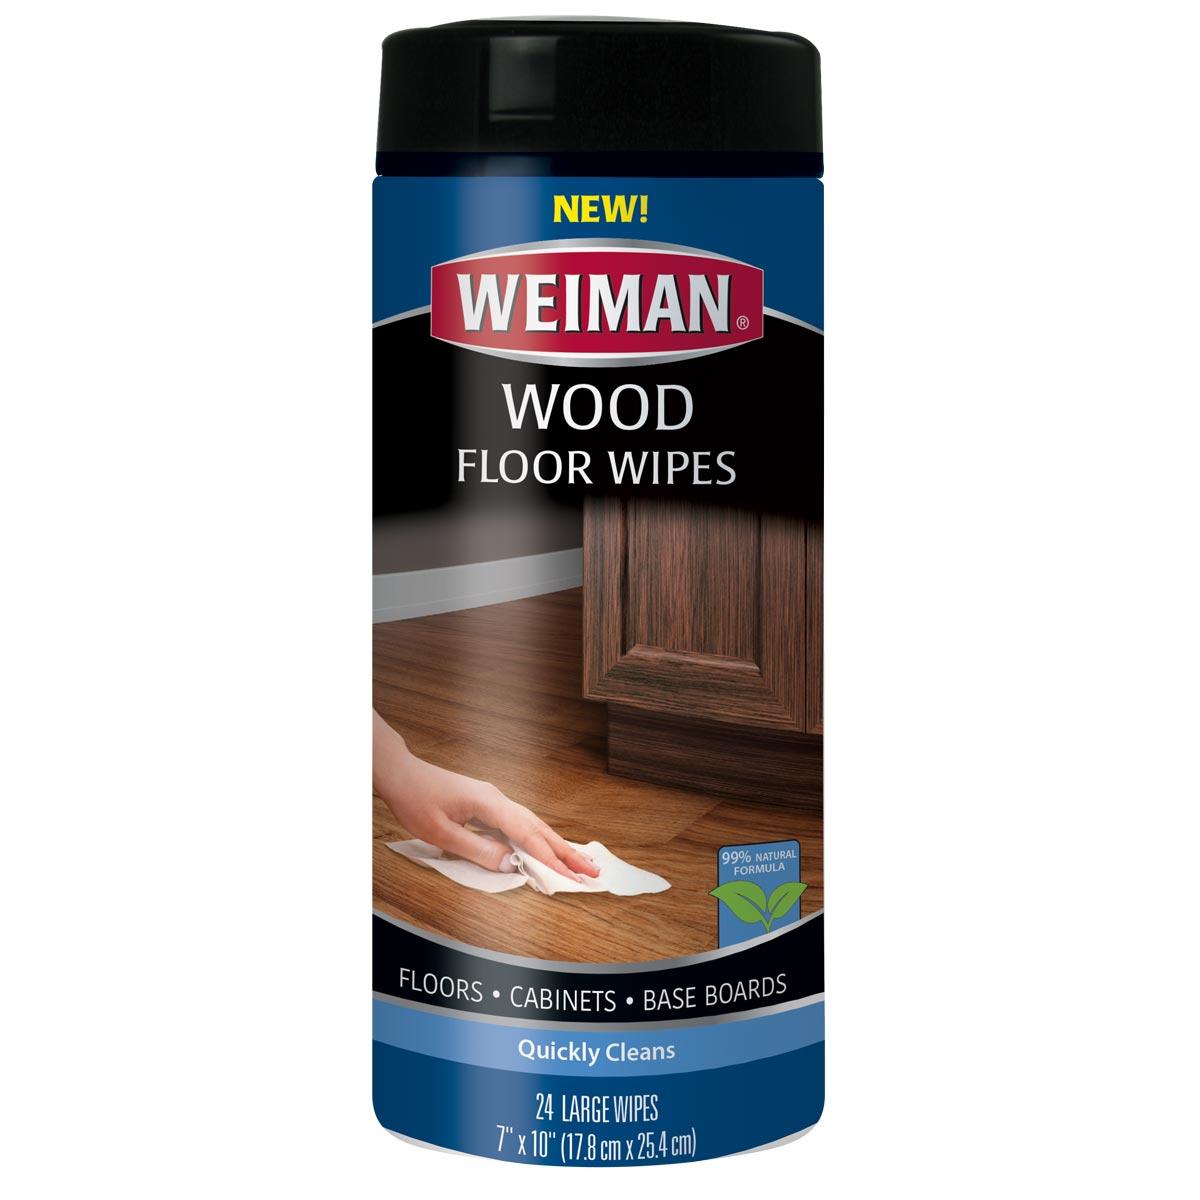 https://googone.com/media/catalog/product/w/e/weiman-wood-floor-wipes_front.jpg